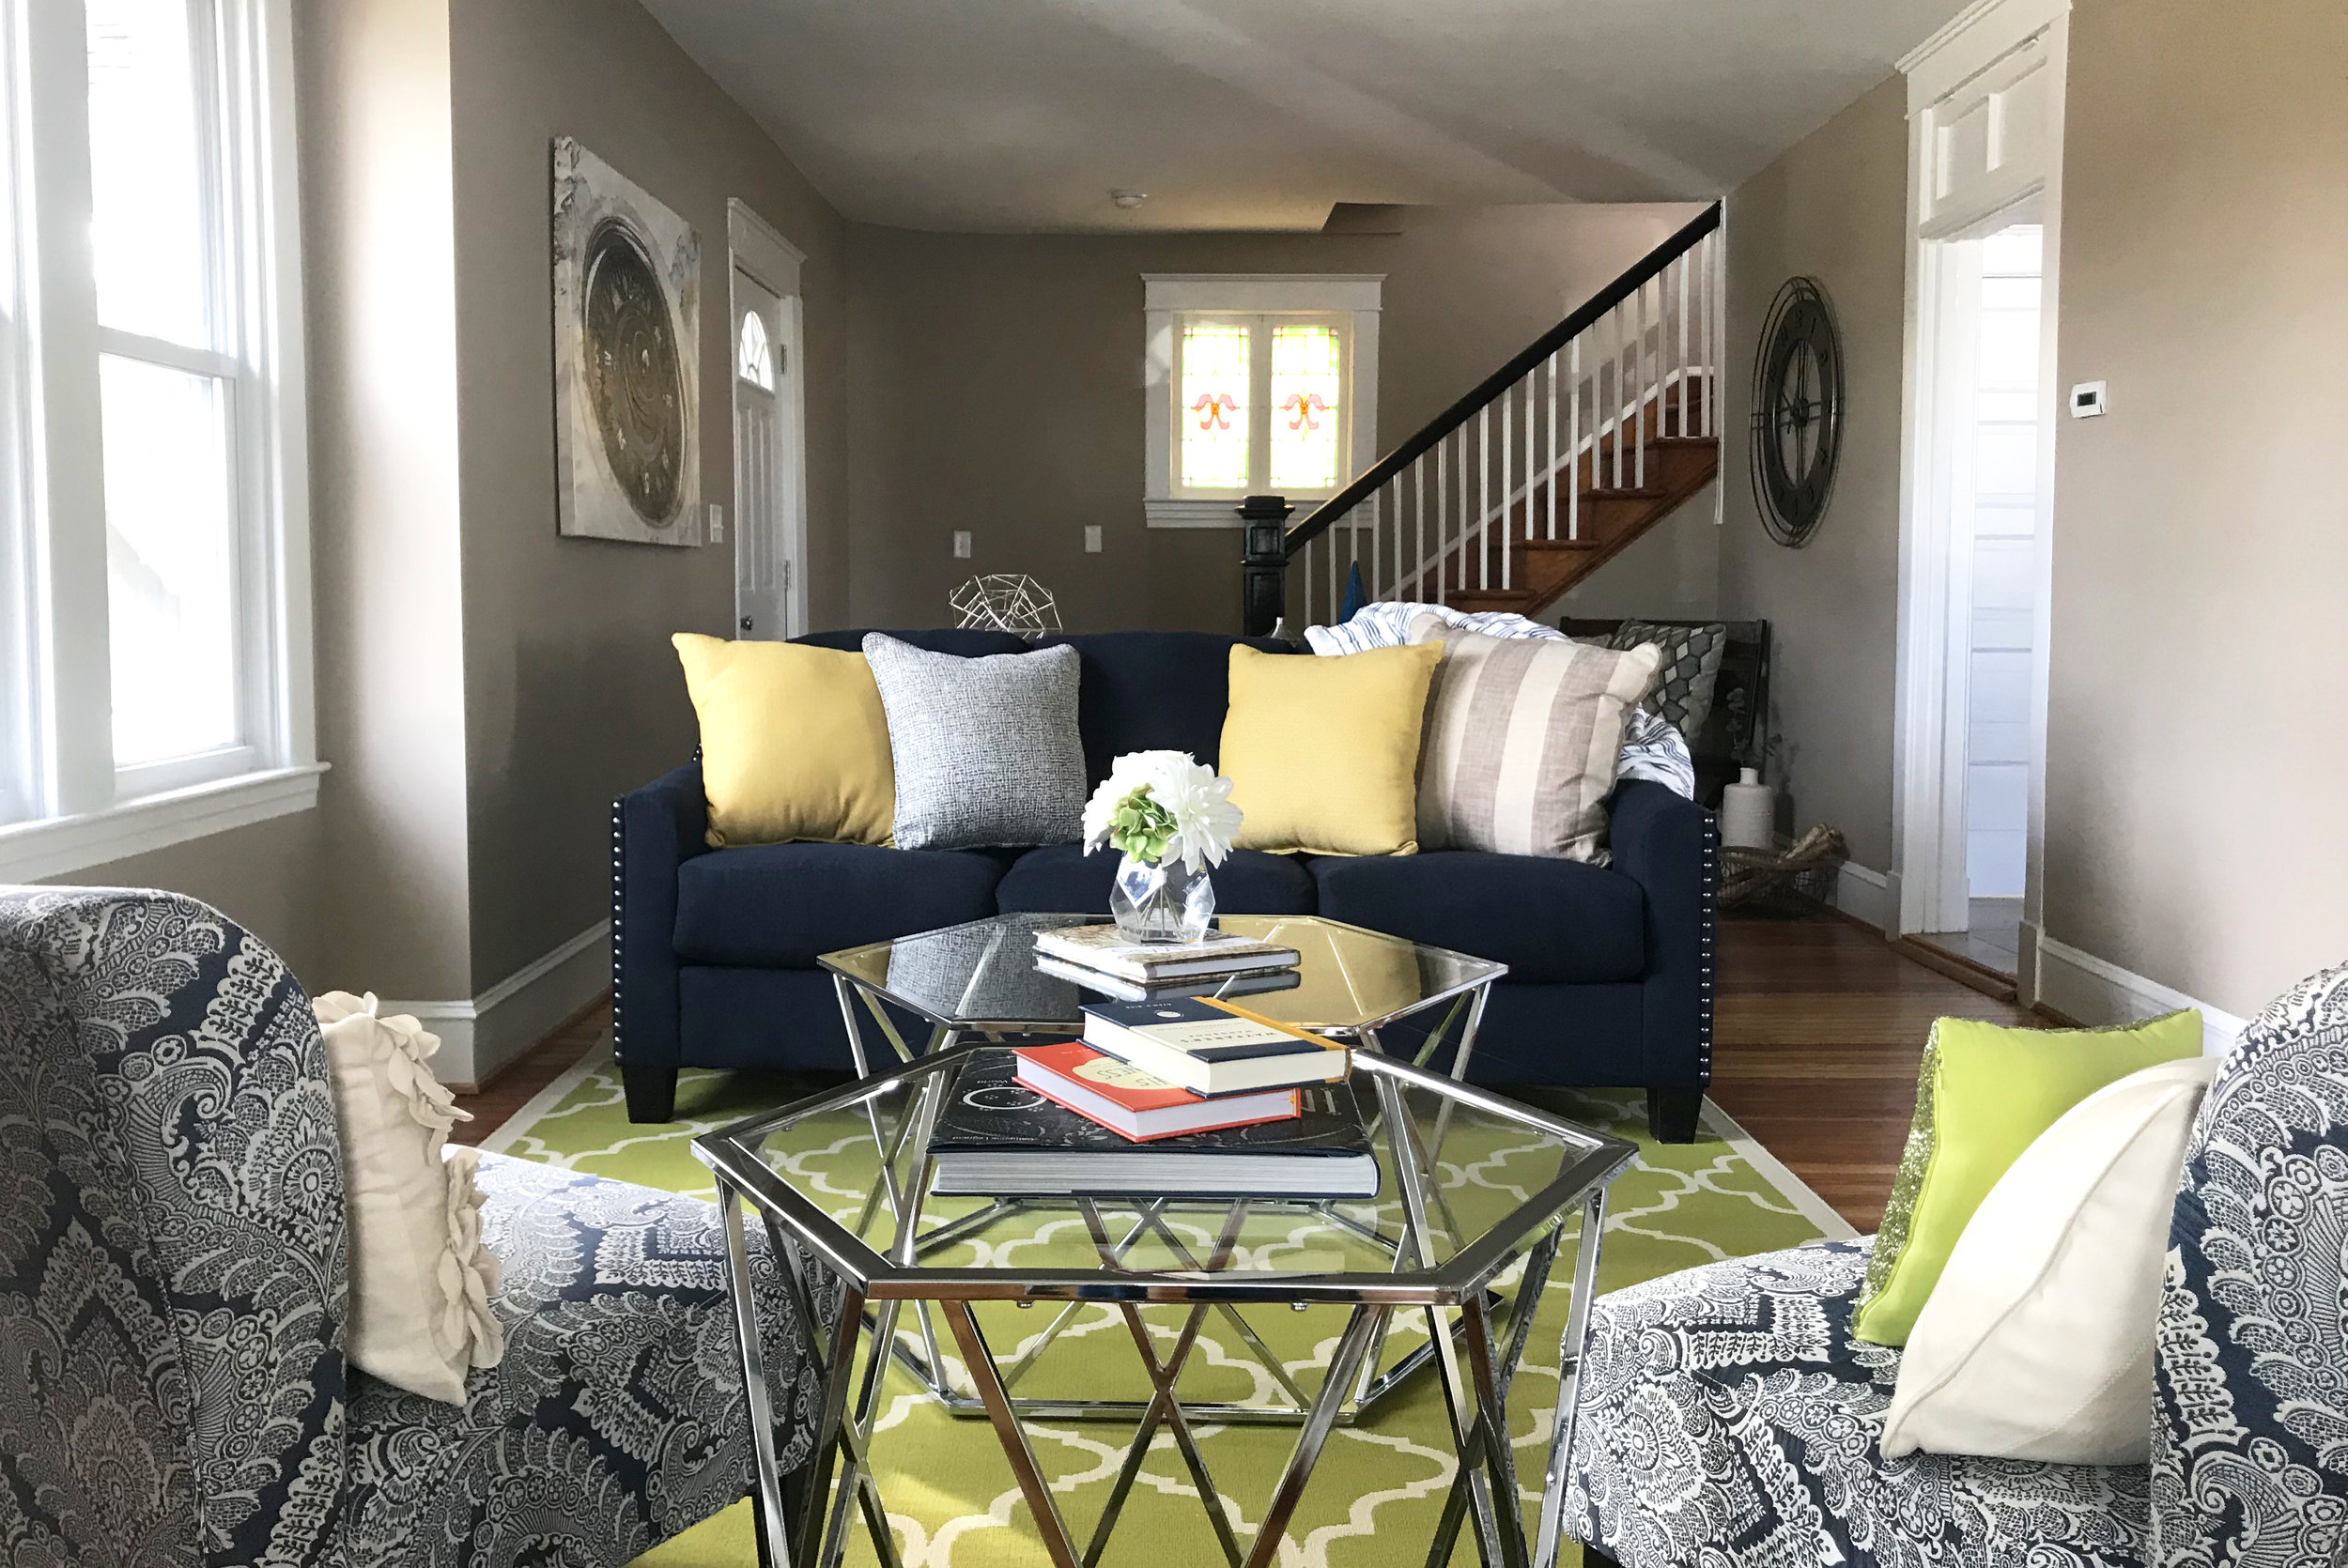 clover-oak-co-stagedtosell-linthicummd-livingroom1.jpg